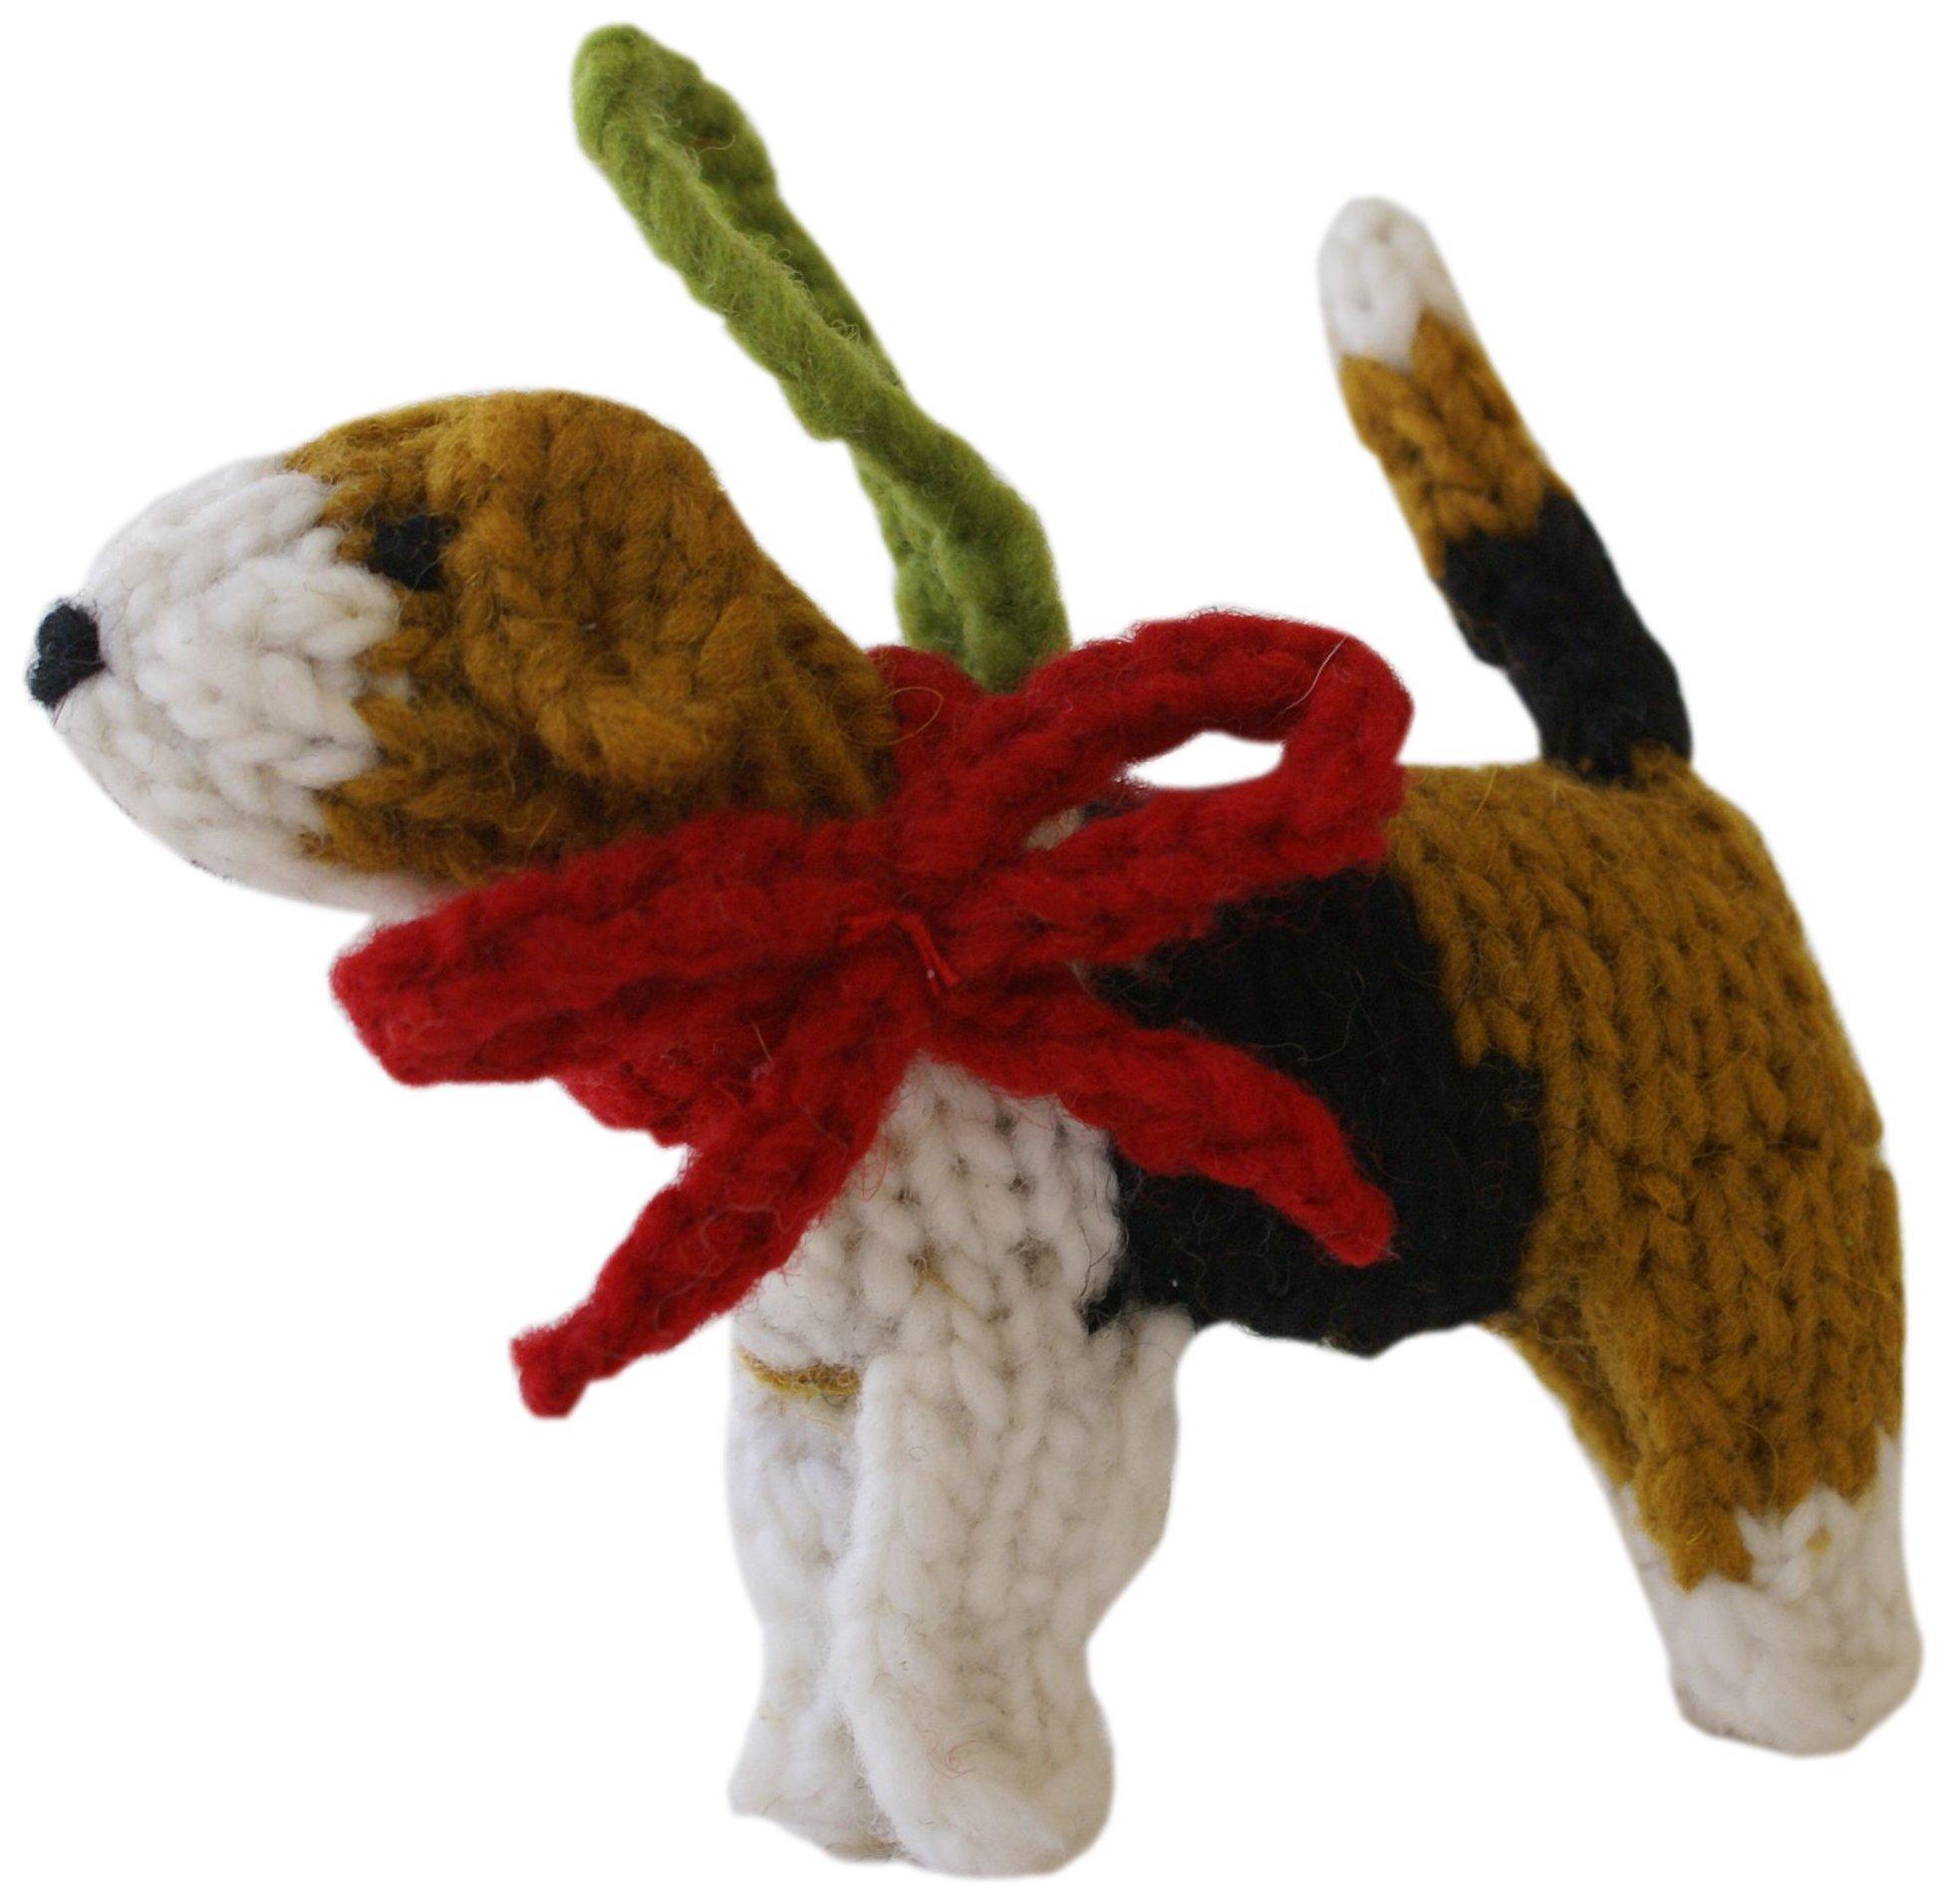 Chilly Dog Beagle Dog Ornament